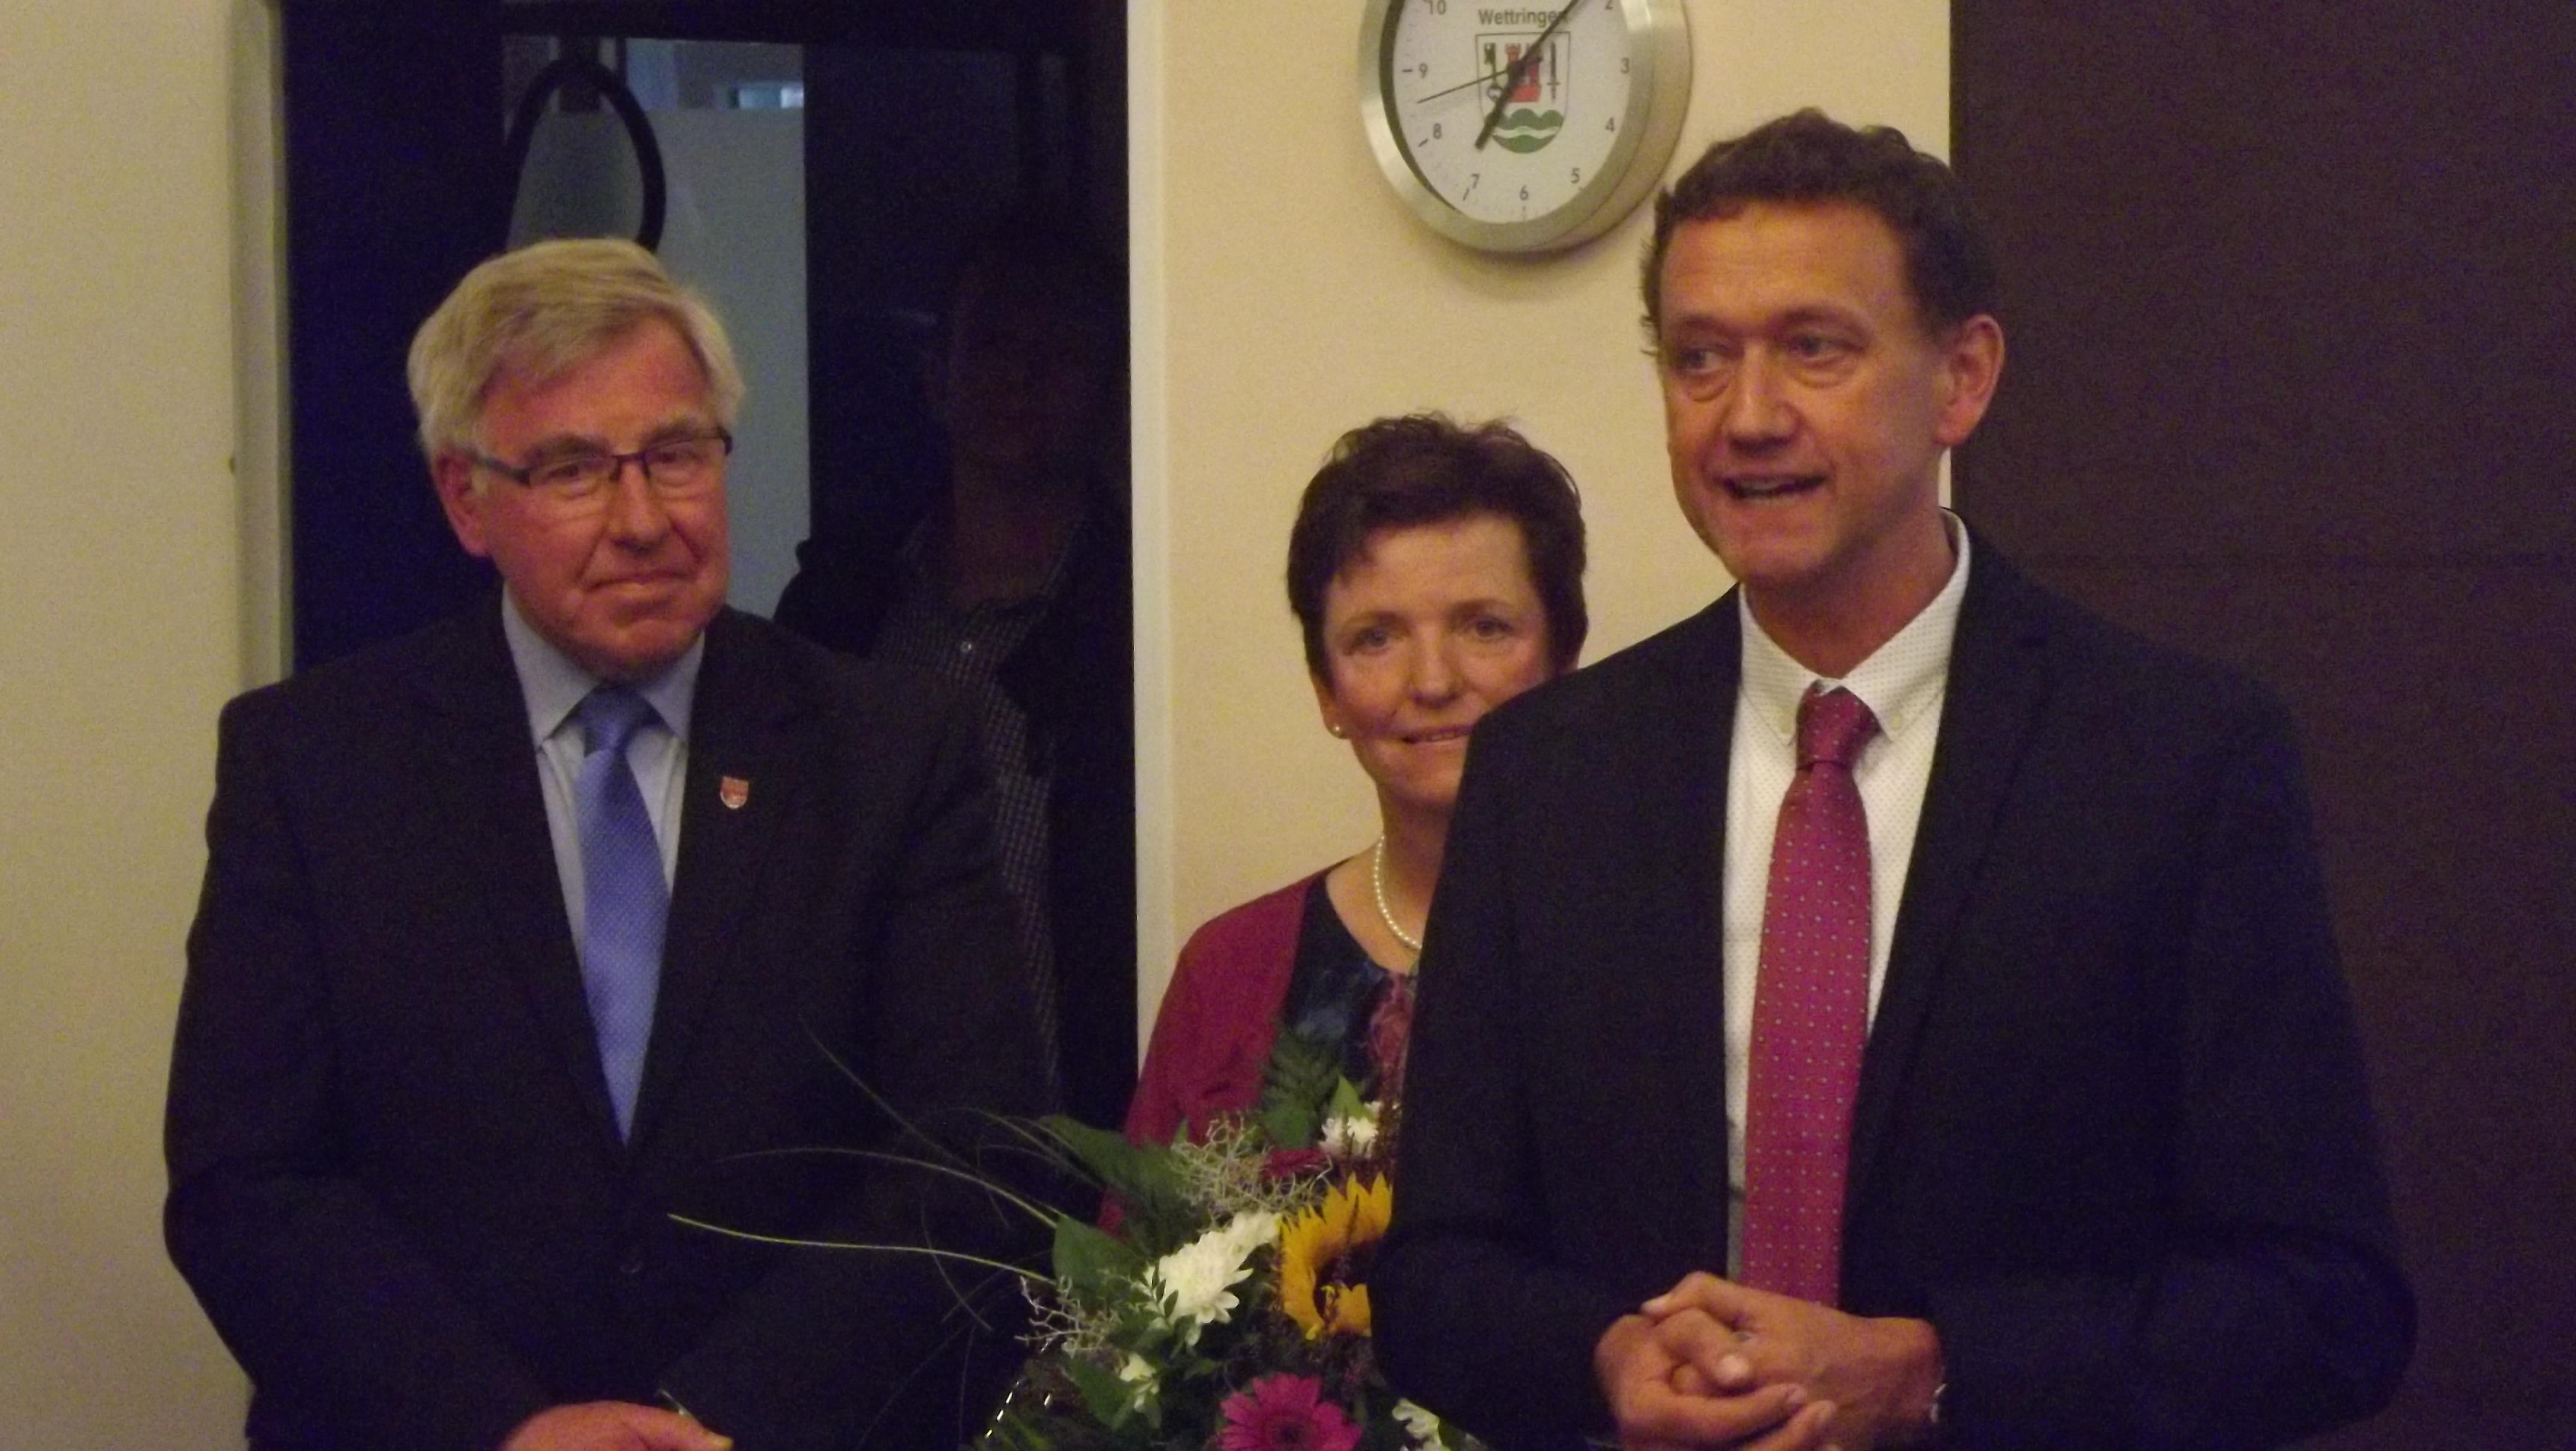 Bertold Bültgerds ist neuer Bürgermeister in Wettringen